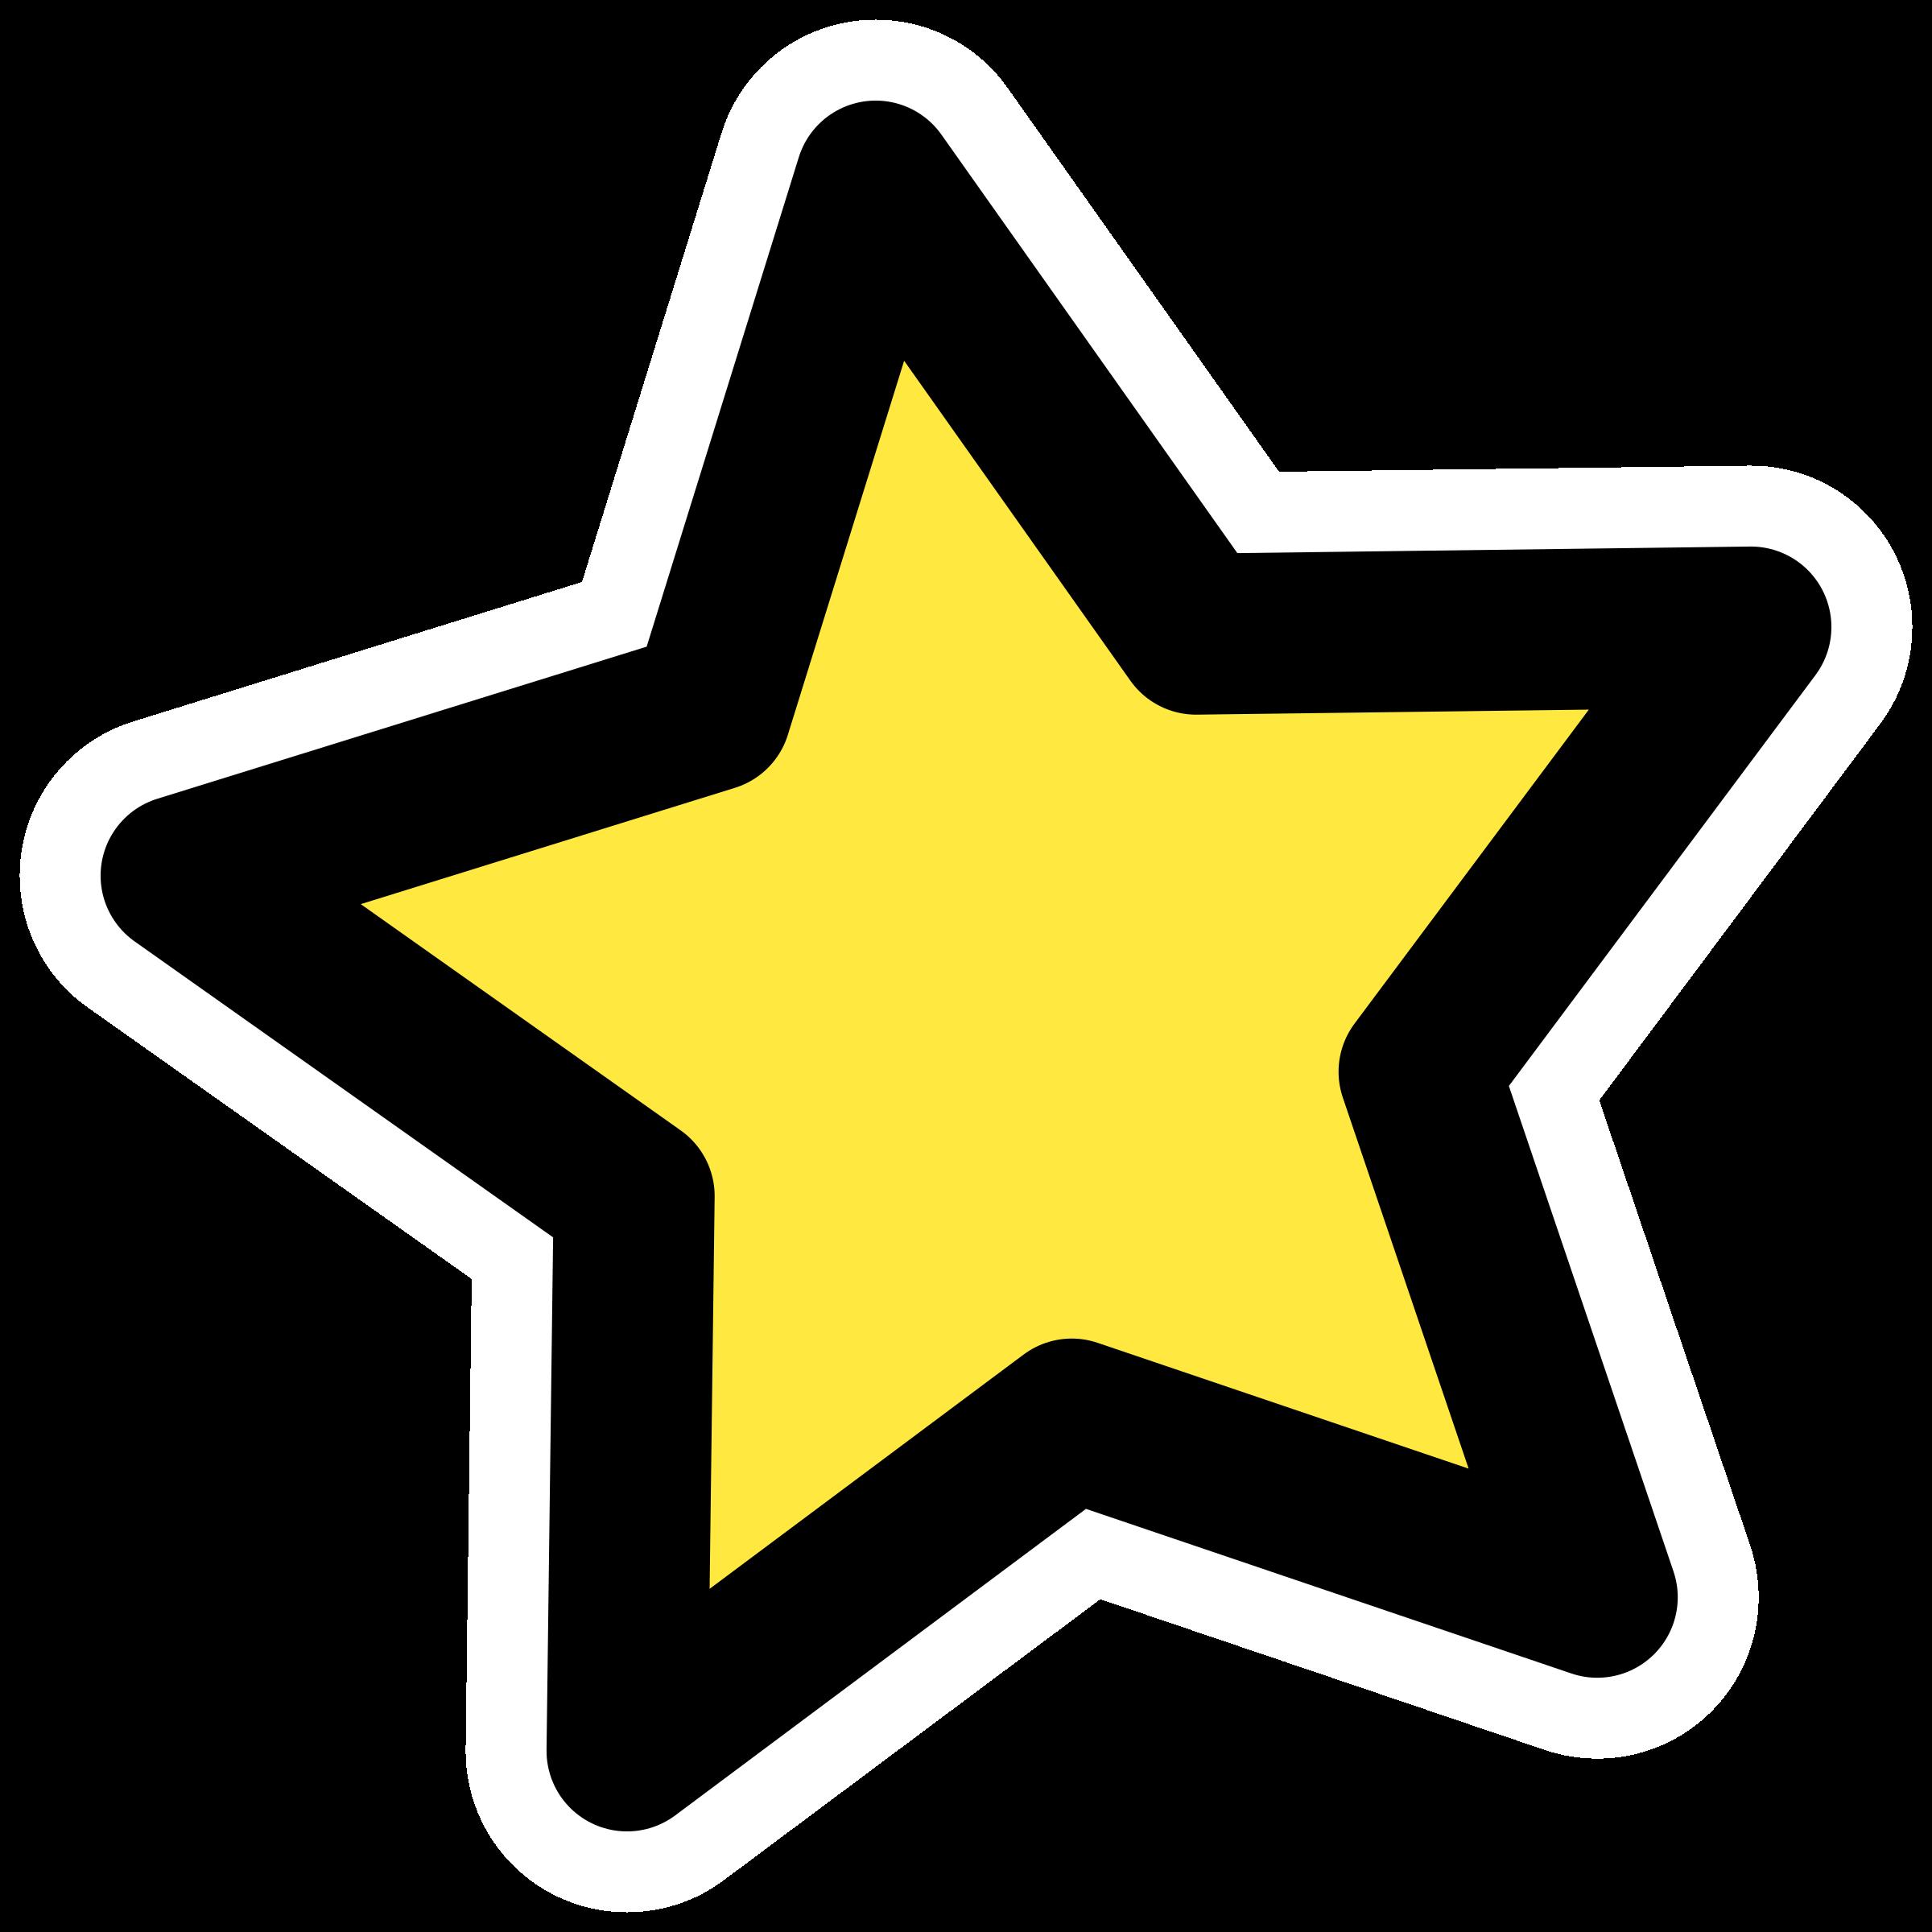 Golden Star Png Image Star Clipart Golden Star Stars